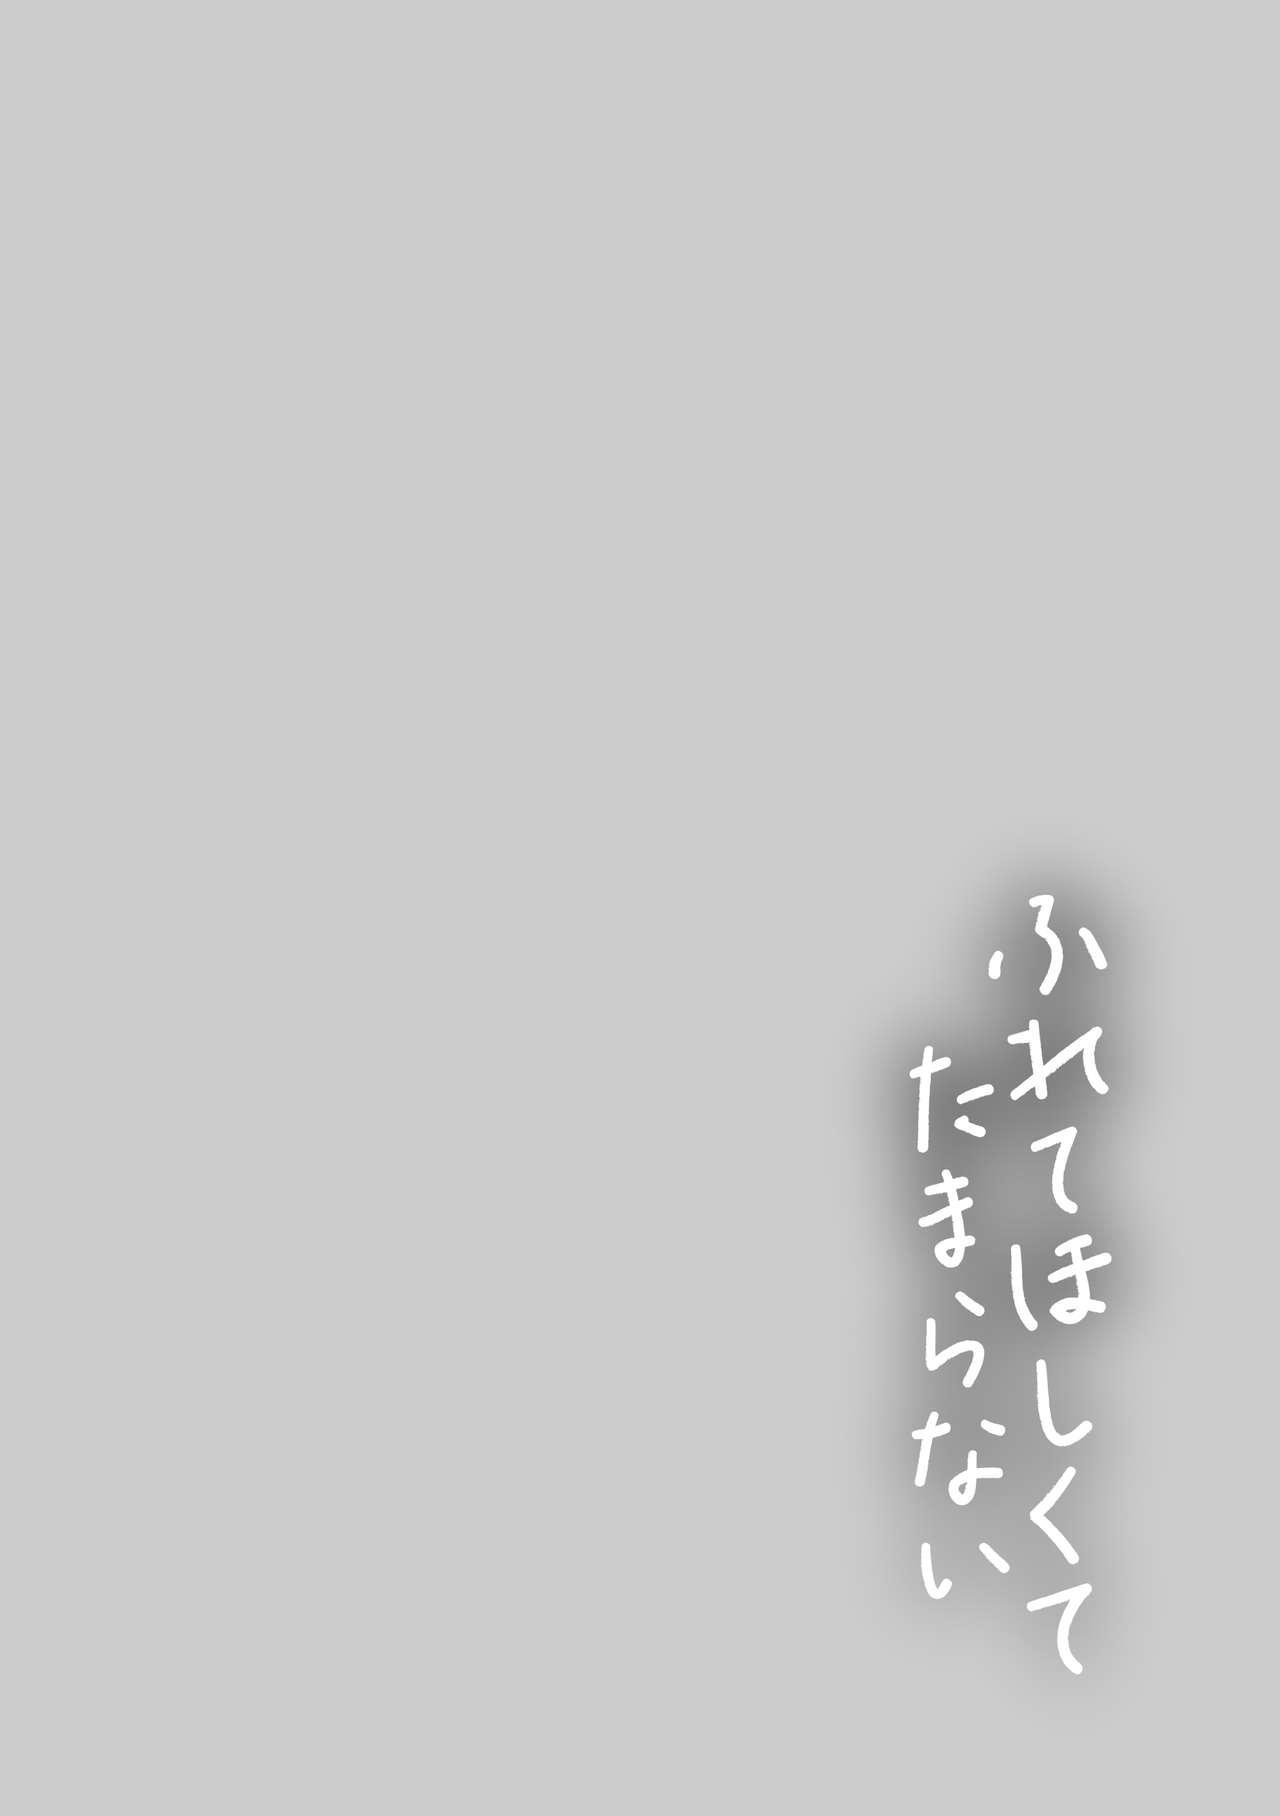 Furete Hoshikute Tamaranai 59